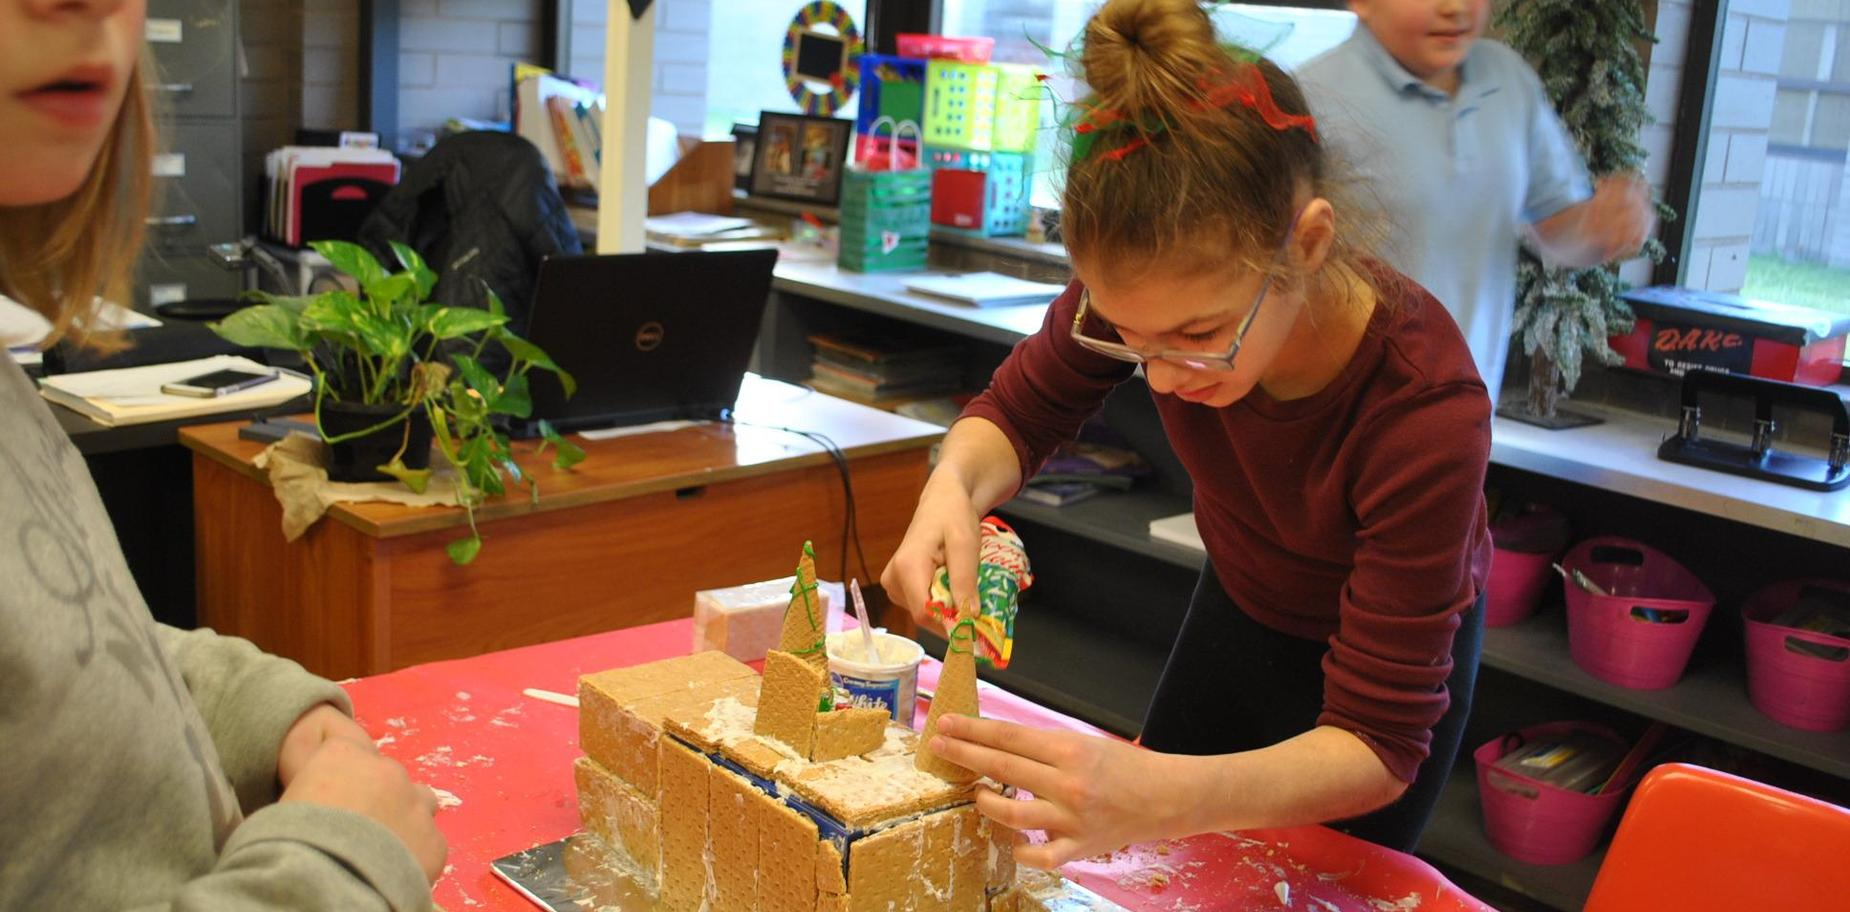 Kids making gingerbread houses